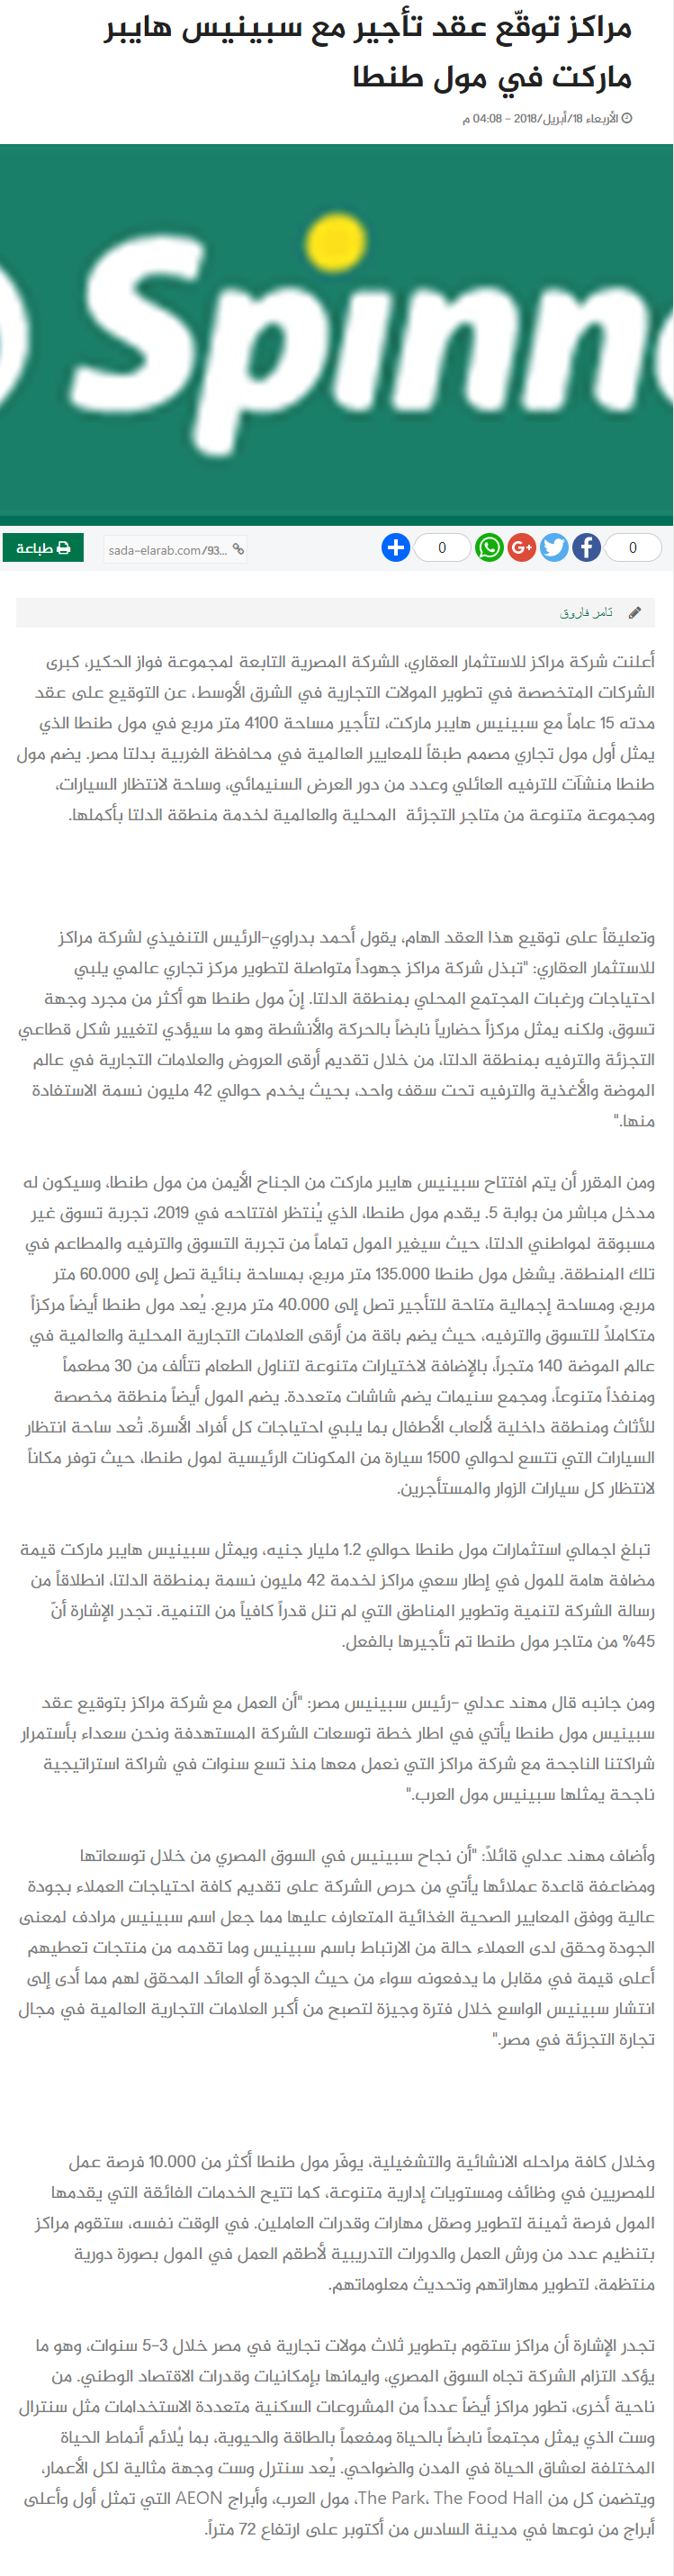 FireShot Capture 905 - صدى العرب_ مراكز توقّع عقد تأجير مع سبيني_ - http___www.sada-elarab.com_93337.png